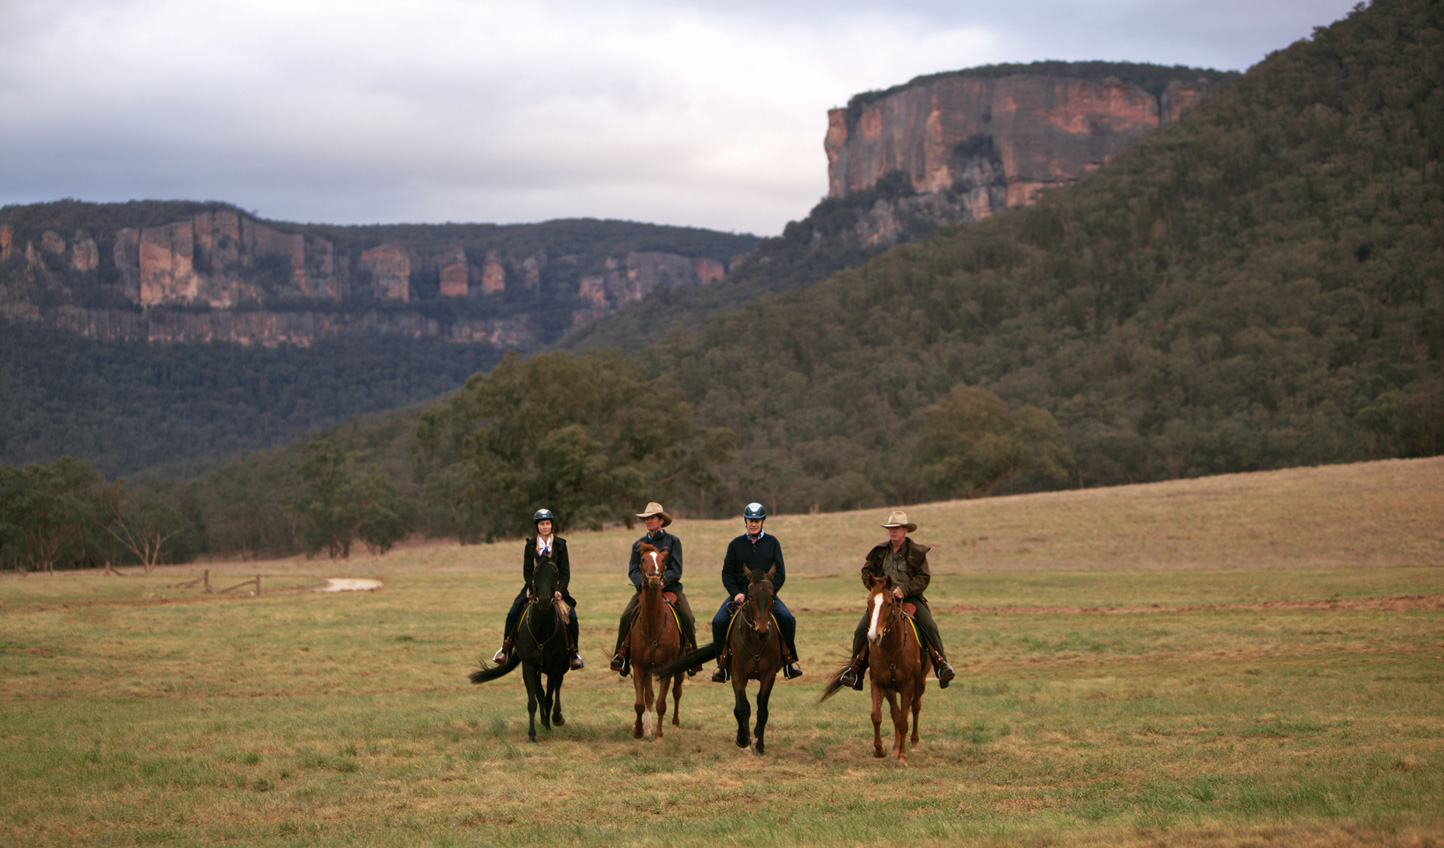 Explore the valley on horseback